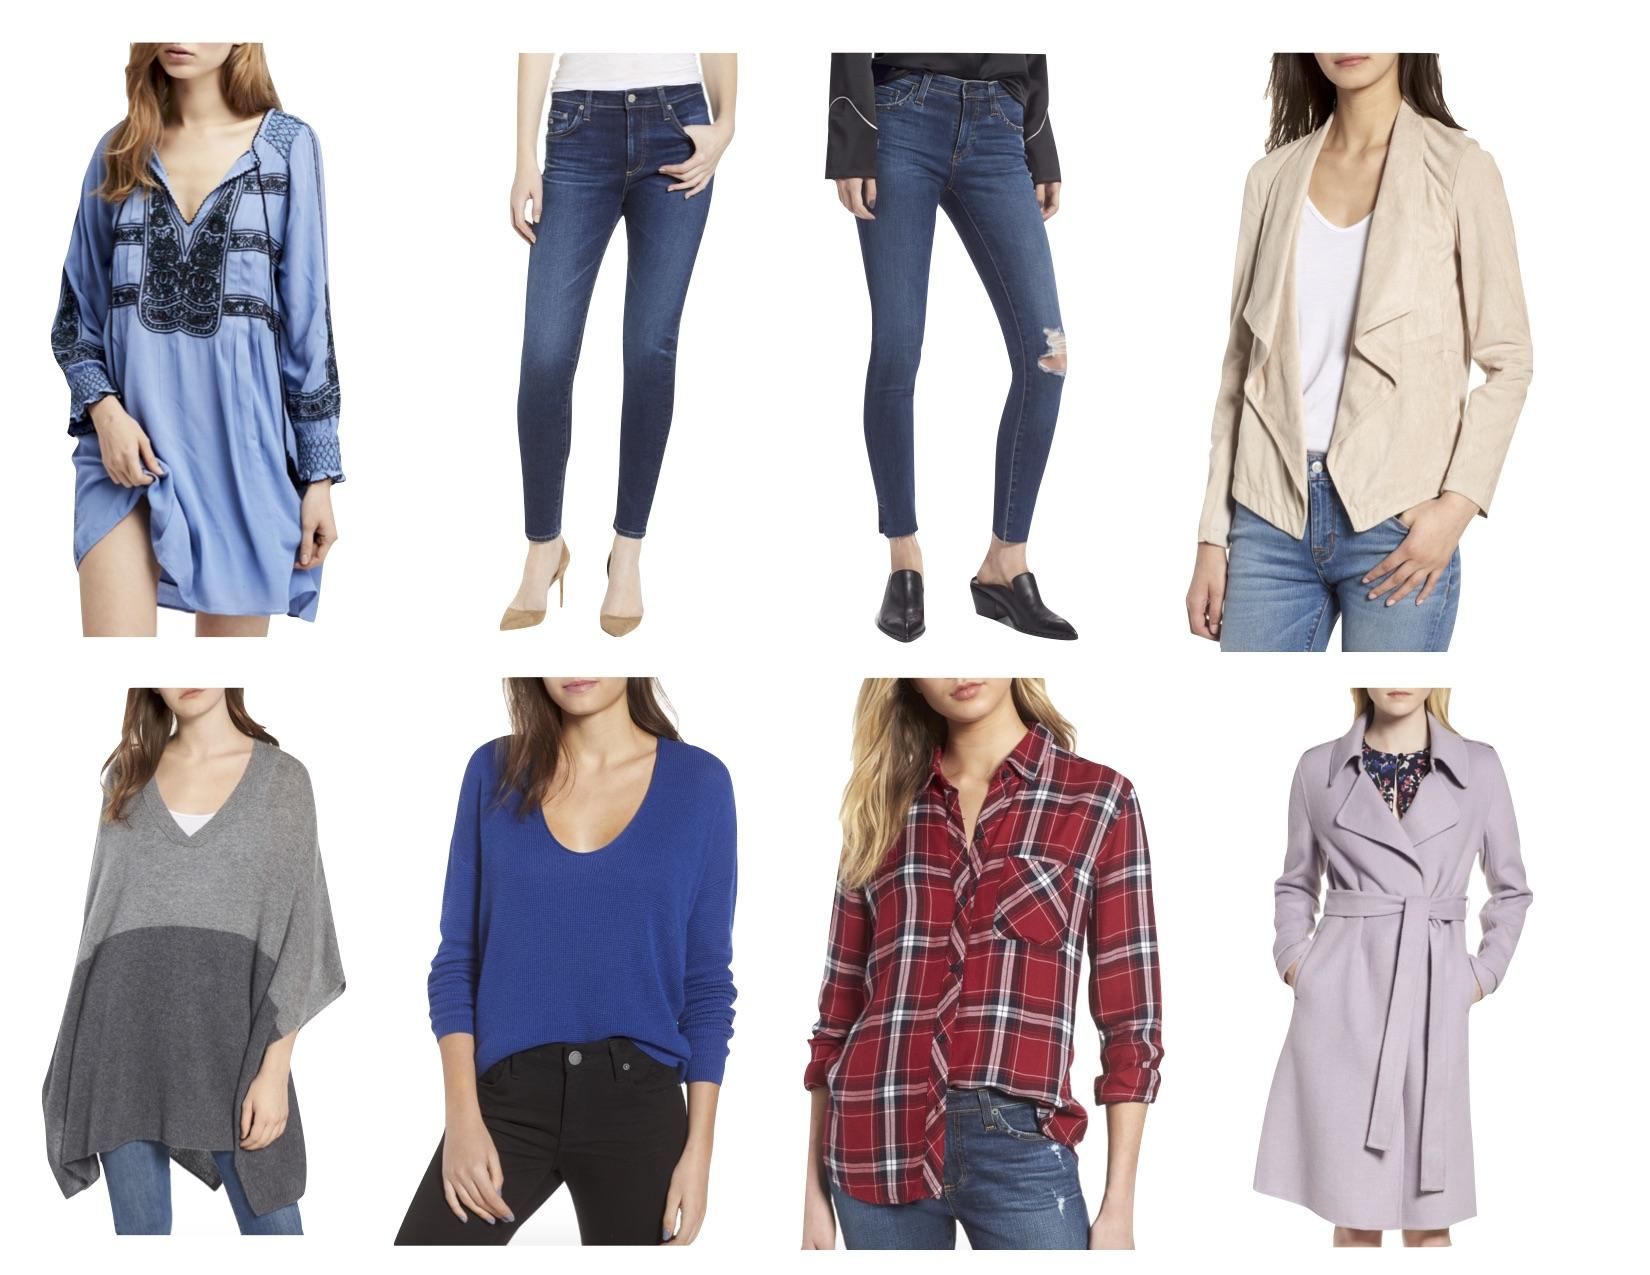 Gray Oak Studio - 2018 Nordstrom Anniversary Sale Women's Clothes Roundup